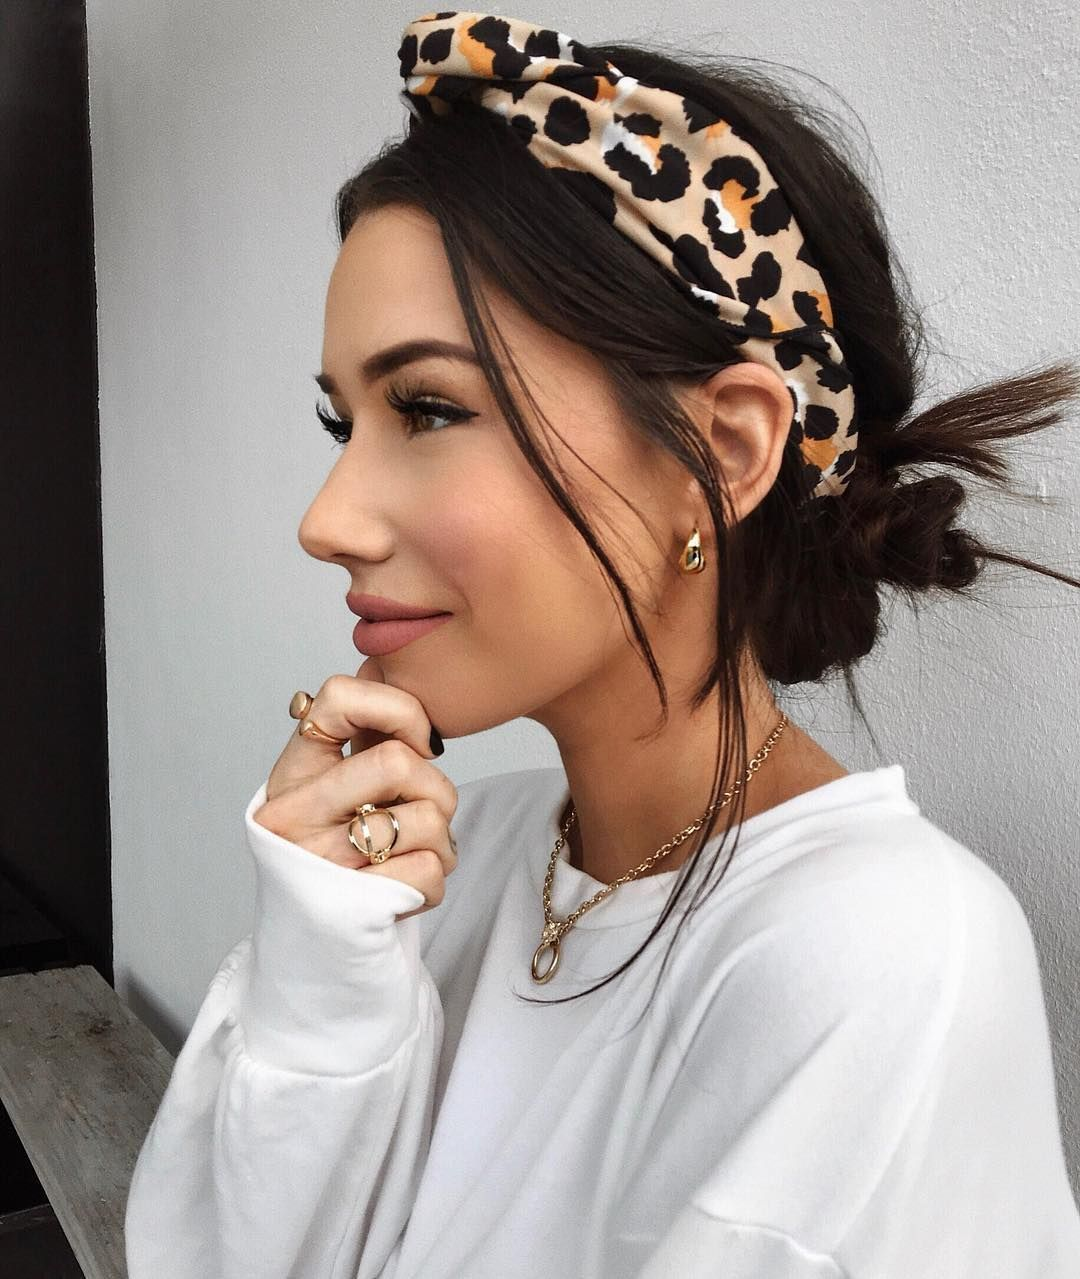 Haaraccessoires online kopen | Fashionchick.nl | Alle trends